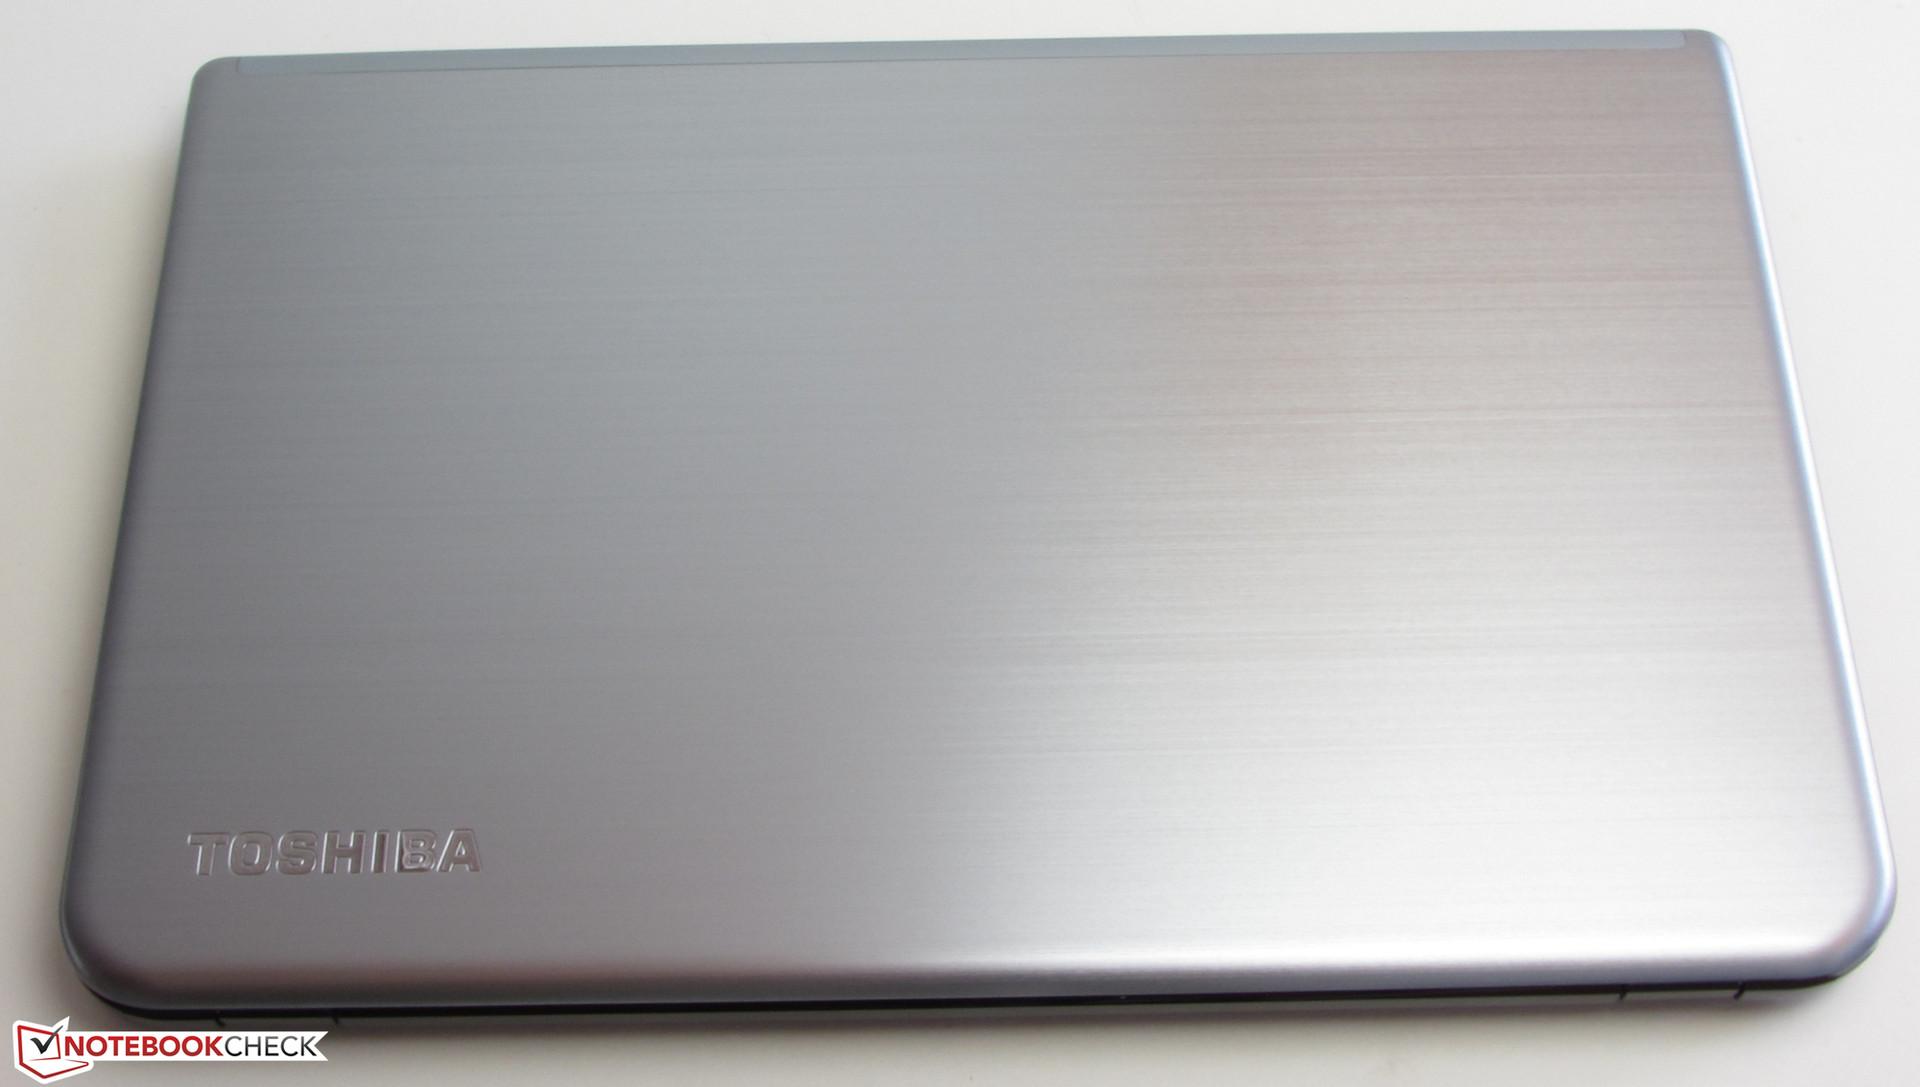 Toshiba Satellite M50 Infrared Treiber Windows 10